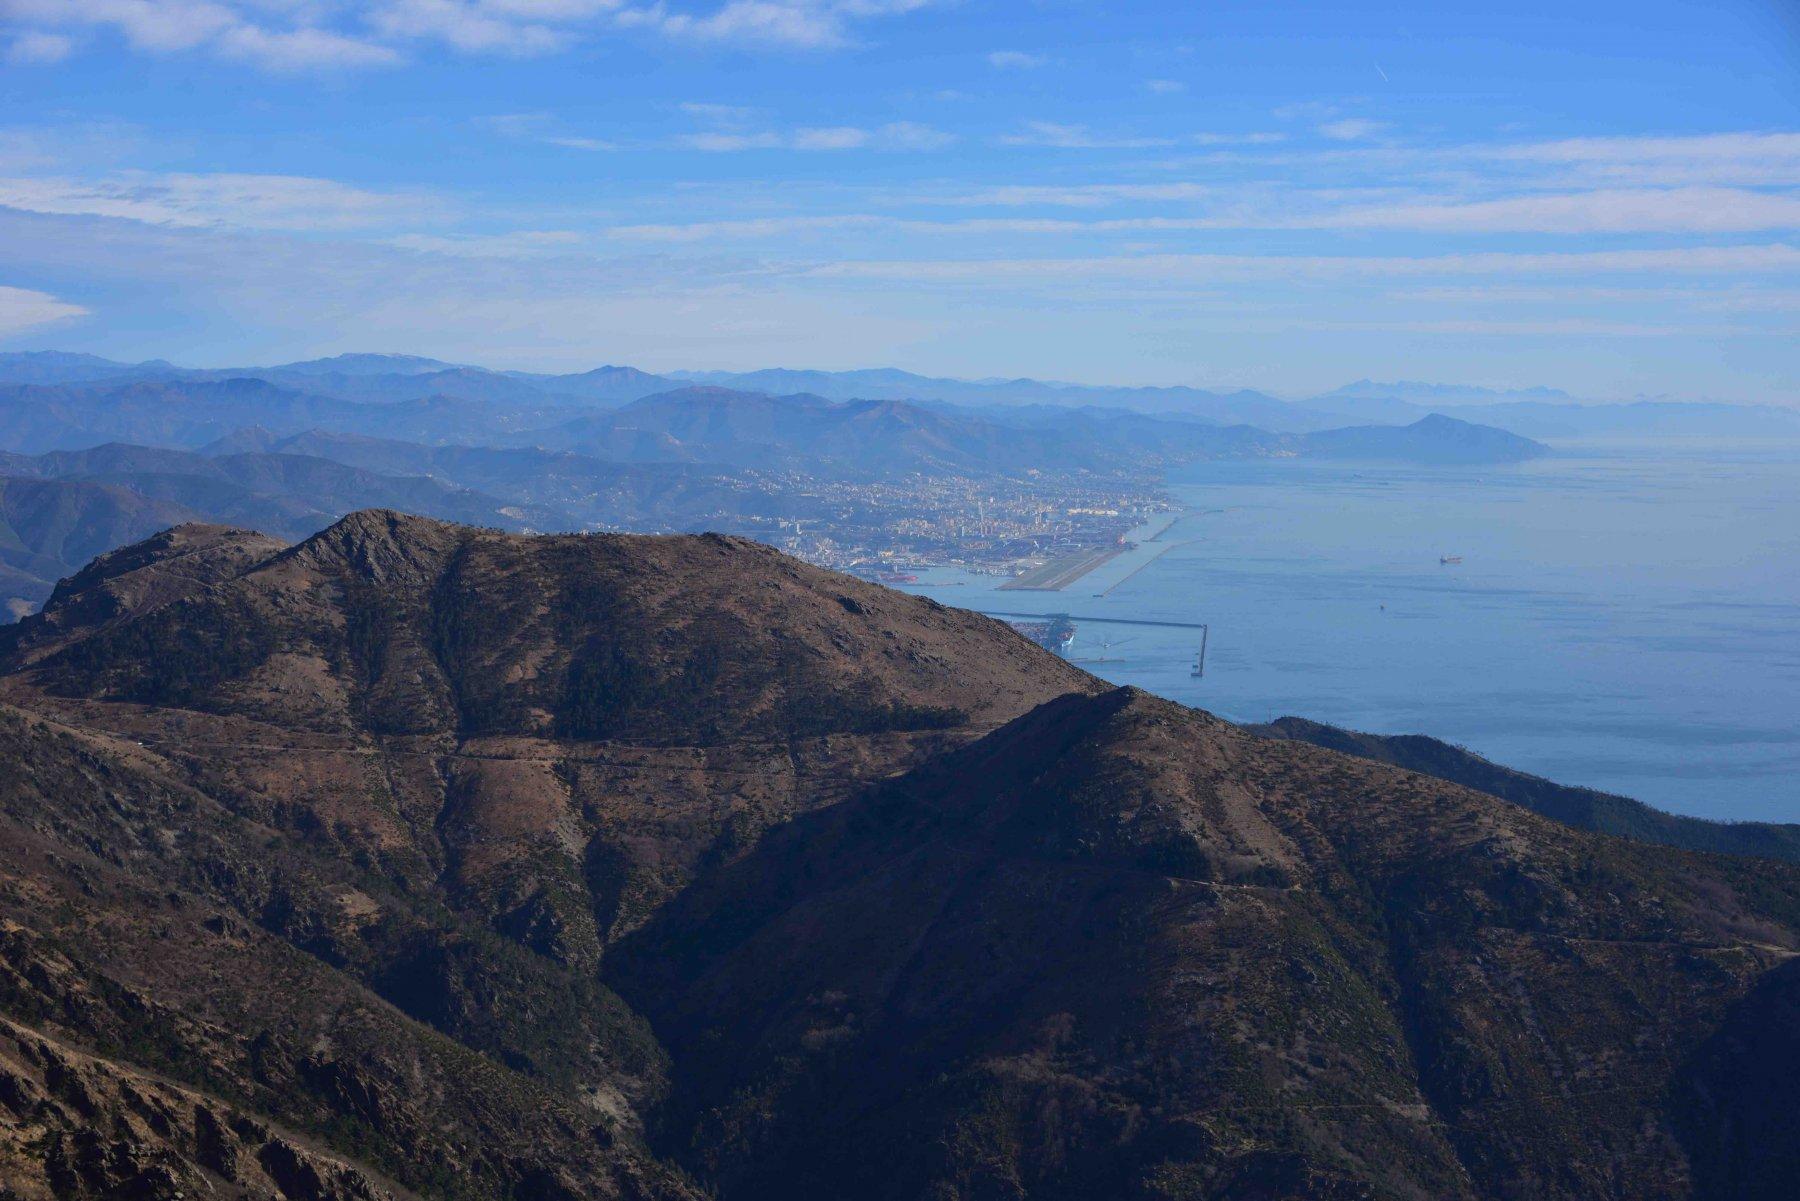 Veduta verso Genova dalla vetta.